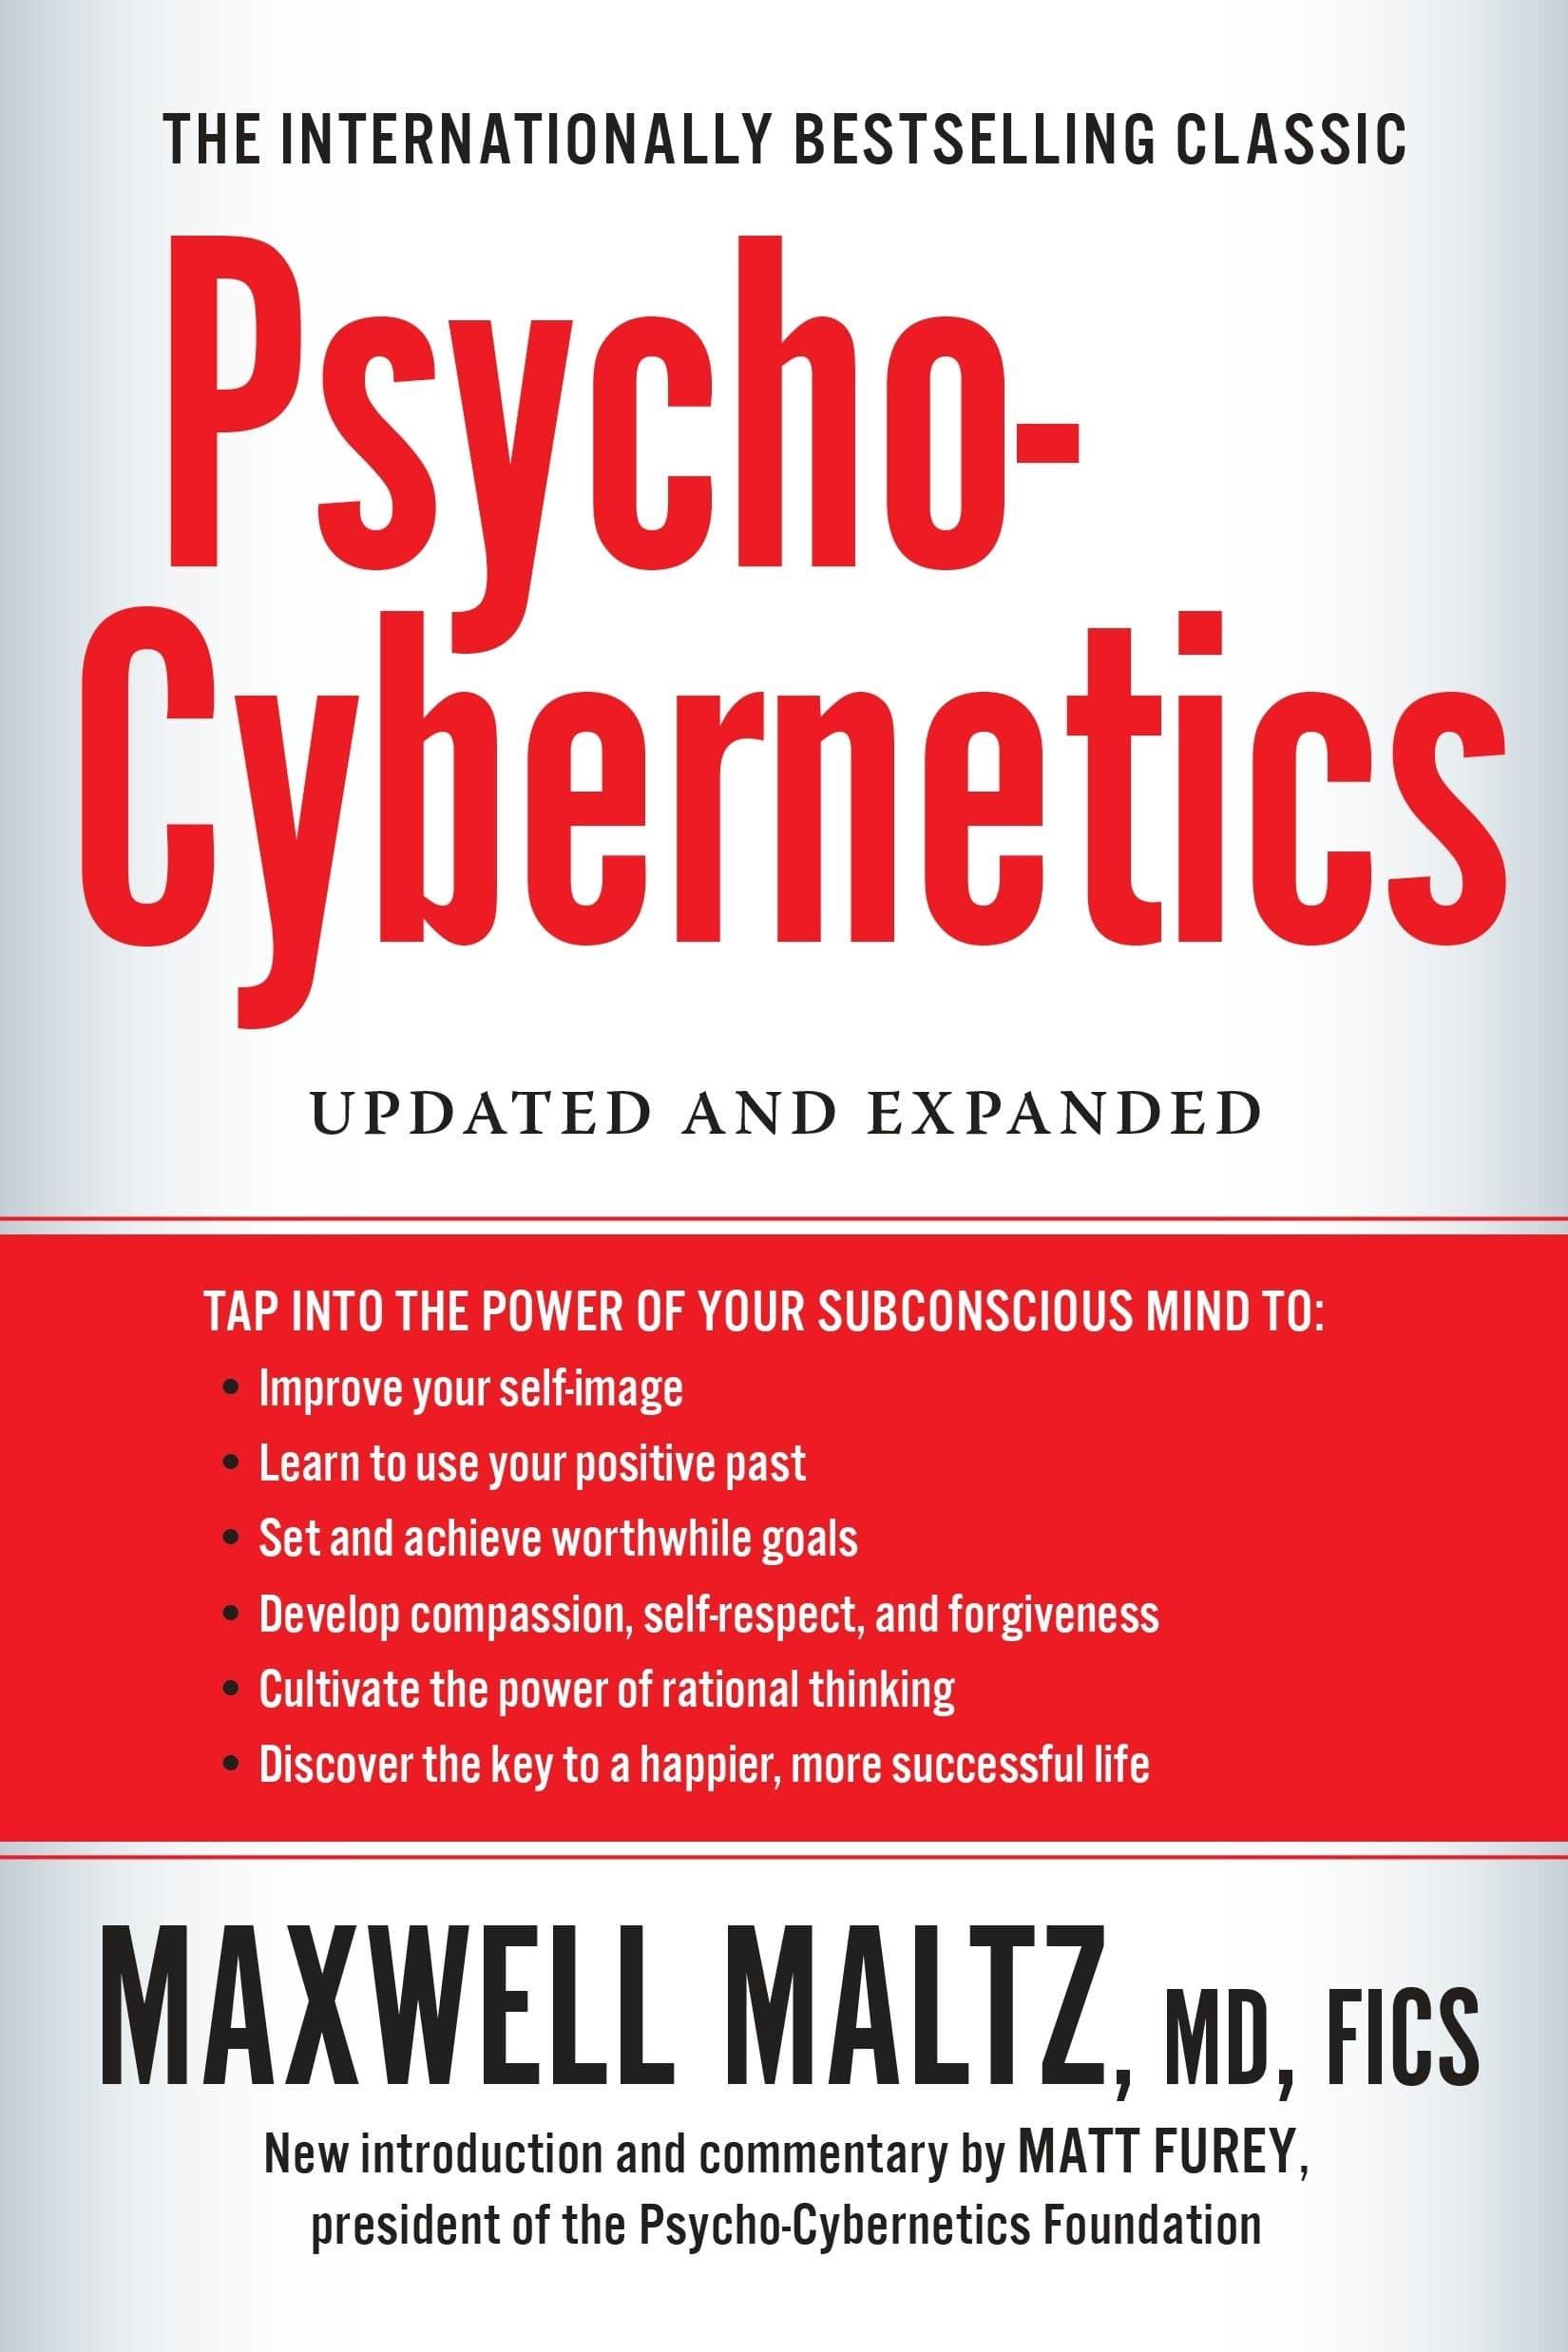 Matt furey psycho cybernetics